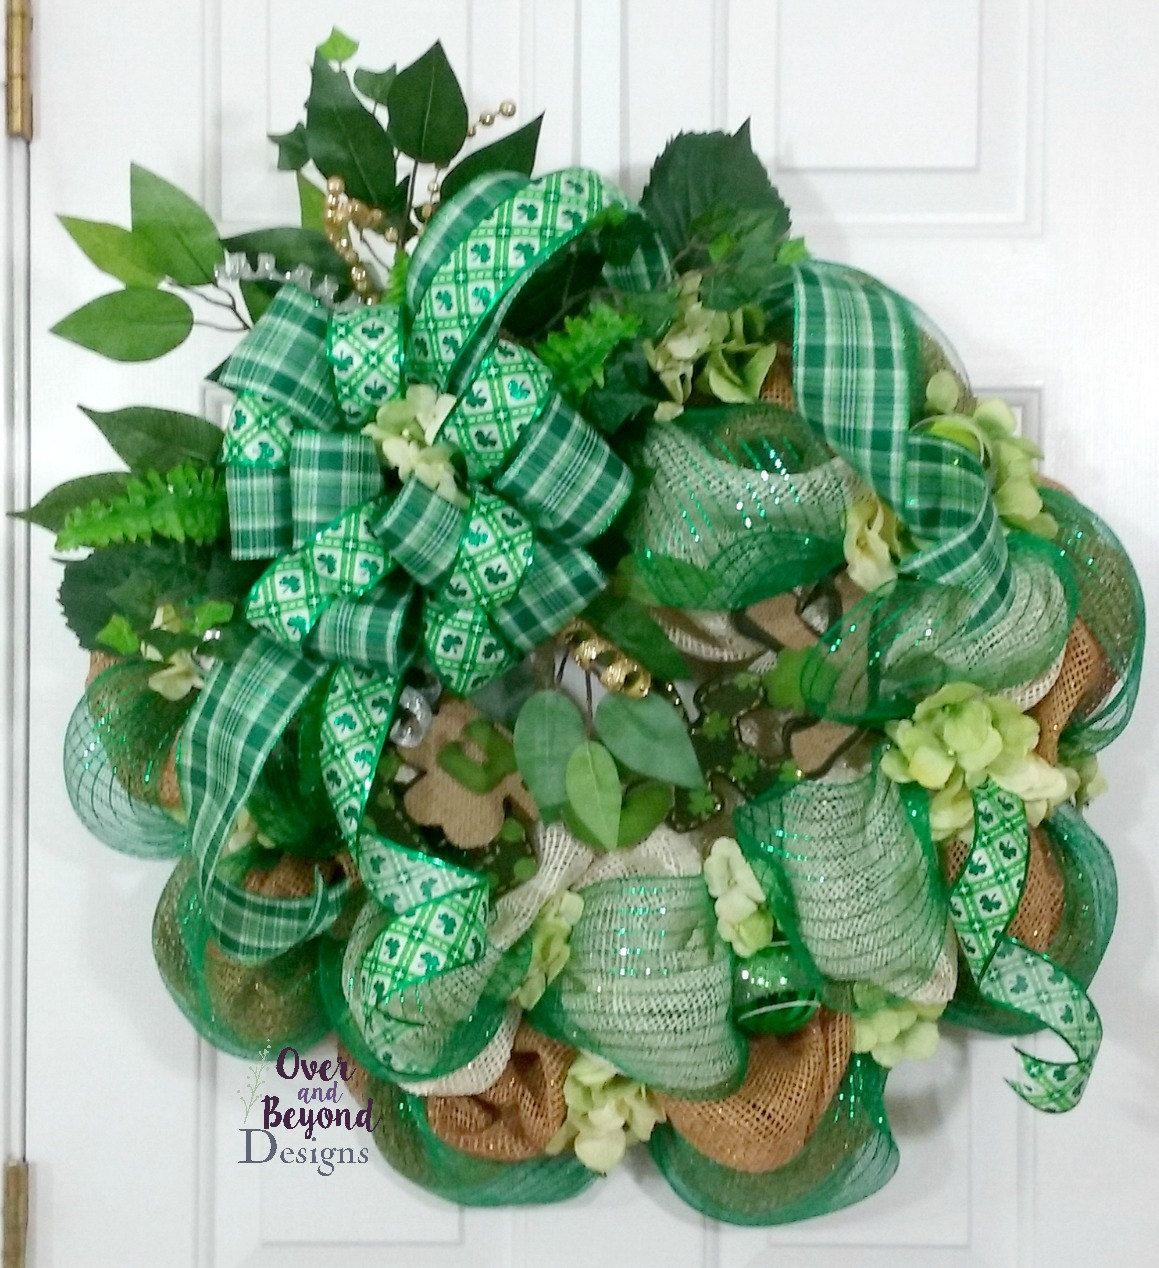 st patricks day wreath st patricks day deco mesh wreath st patricks day burlap st patrick 39 s. Black Bedroom Furniture Sets. Home Design Ideas